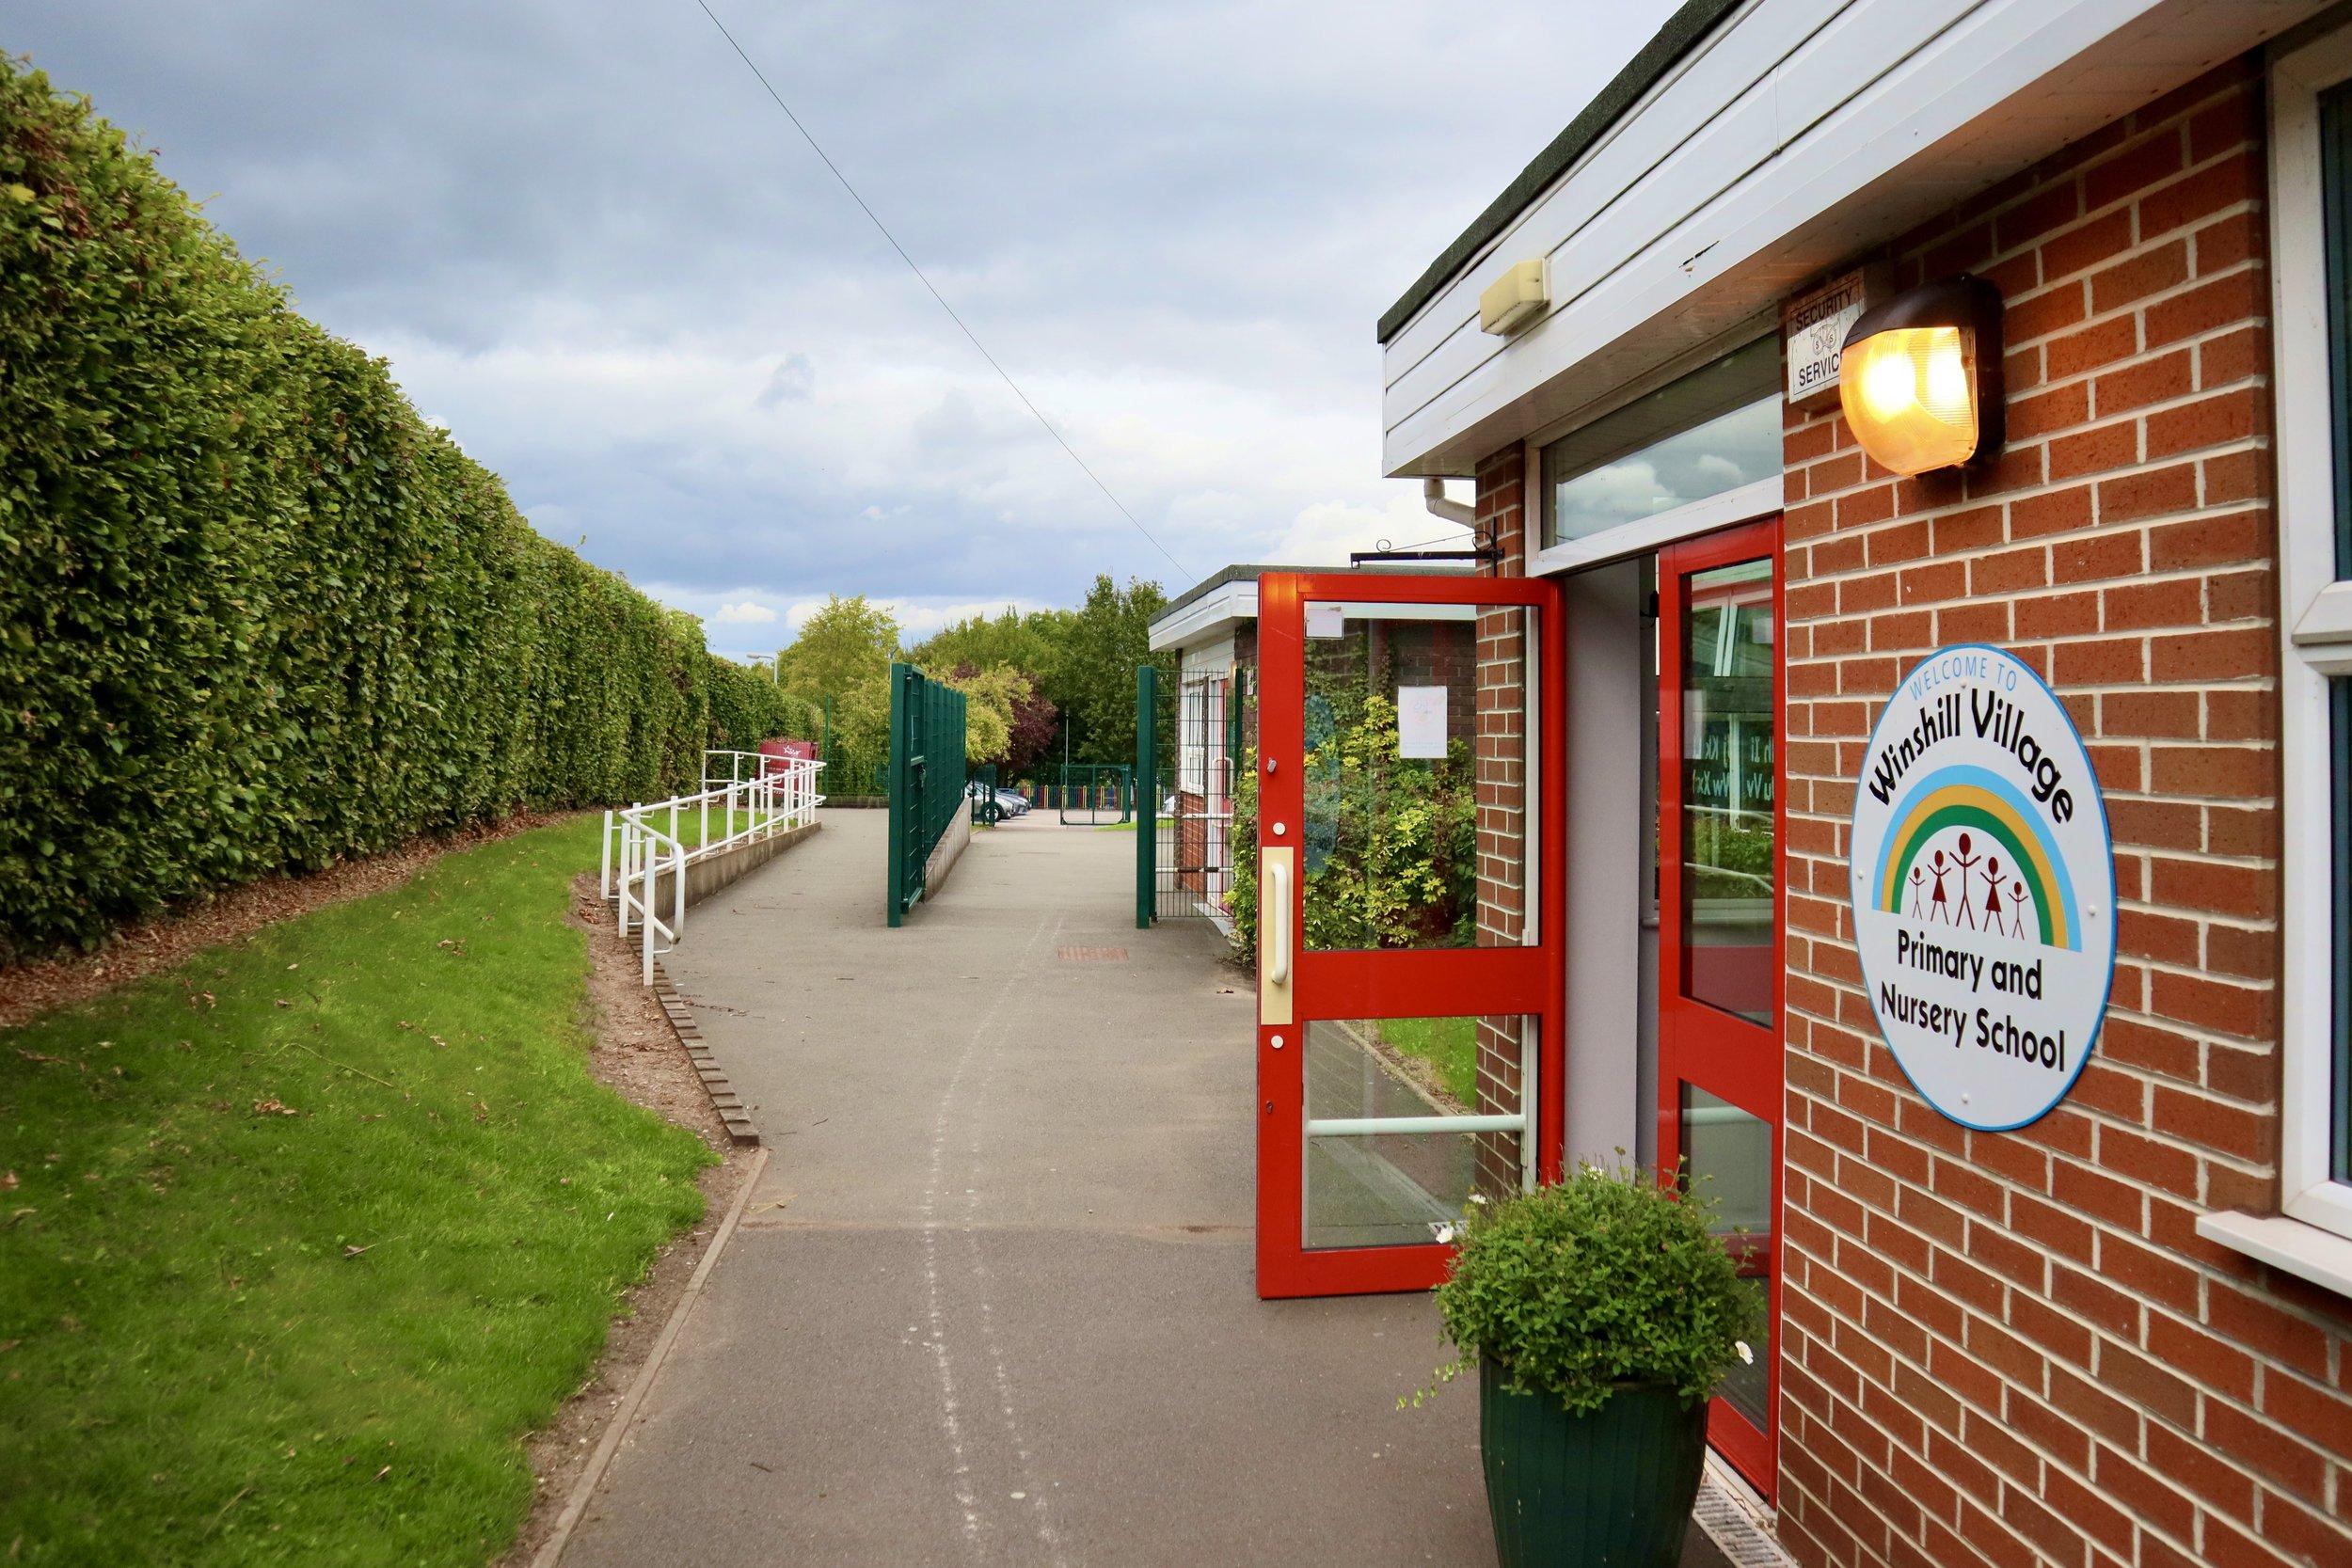 The main school entrance